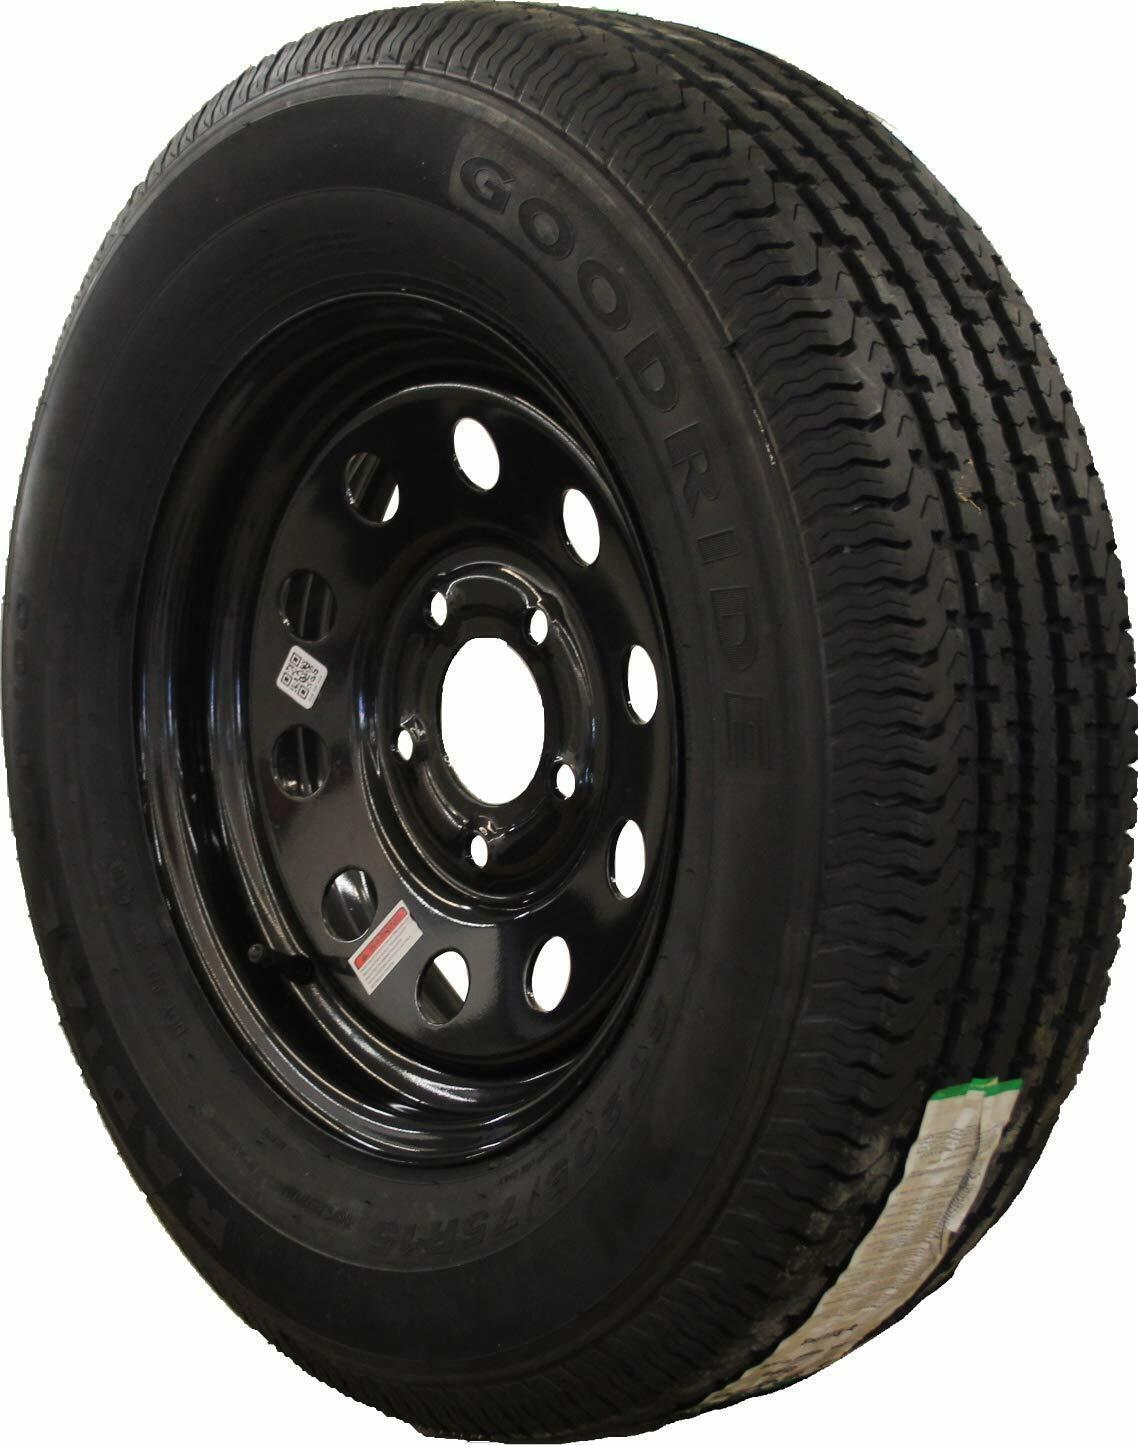 Goodride ST205/75D15 6 Ply Bias Trailer Wheel/Tire Assembly Black MOD 5-4.5